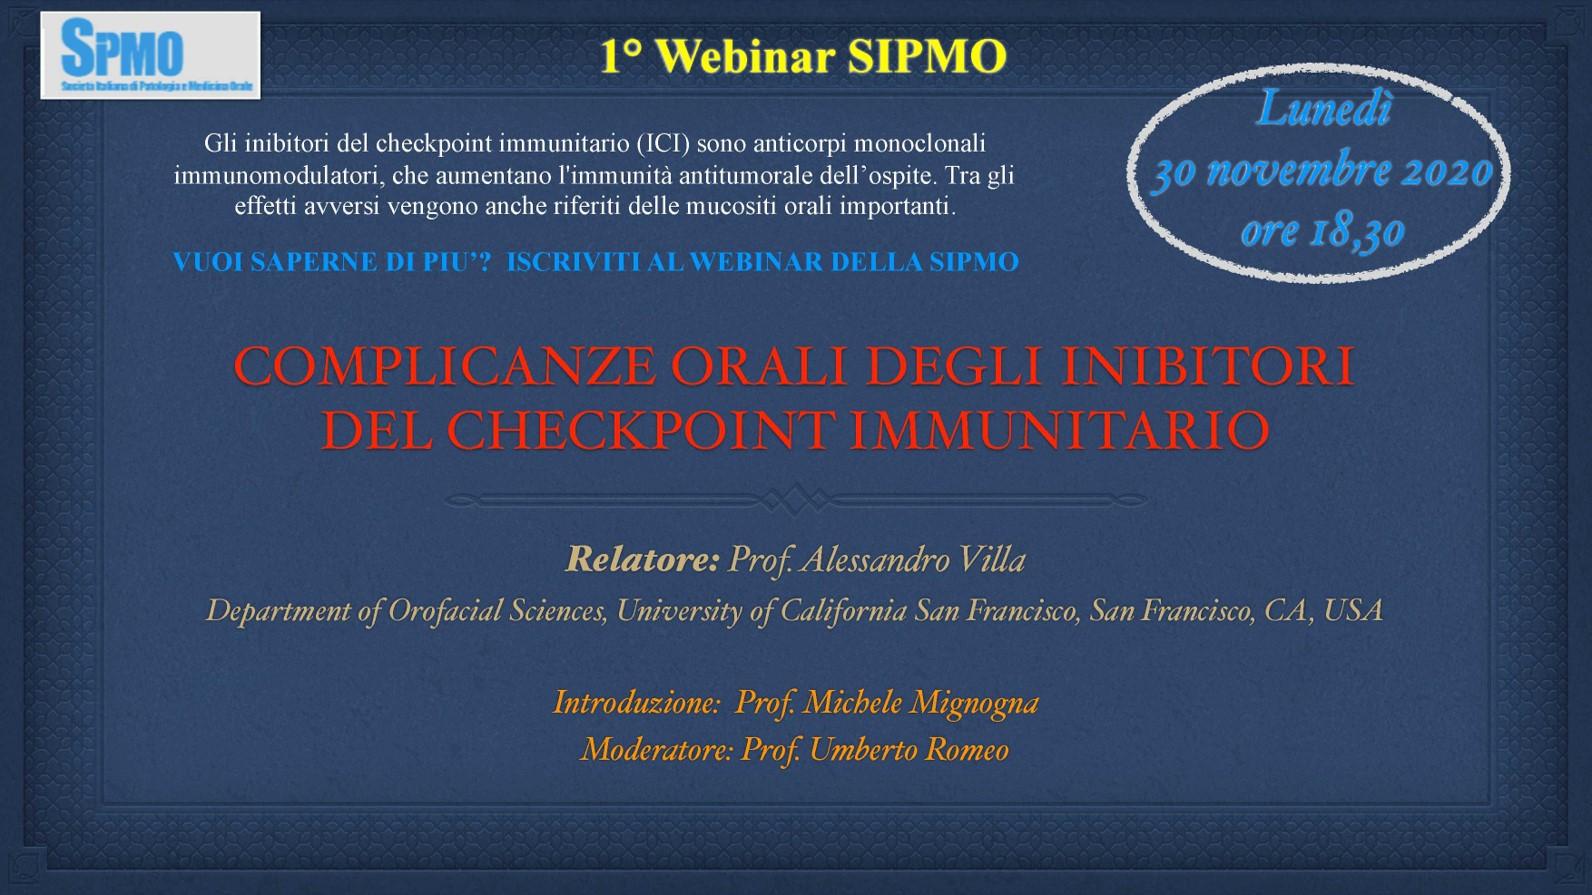 1 webinar SIPMO1